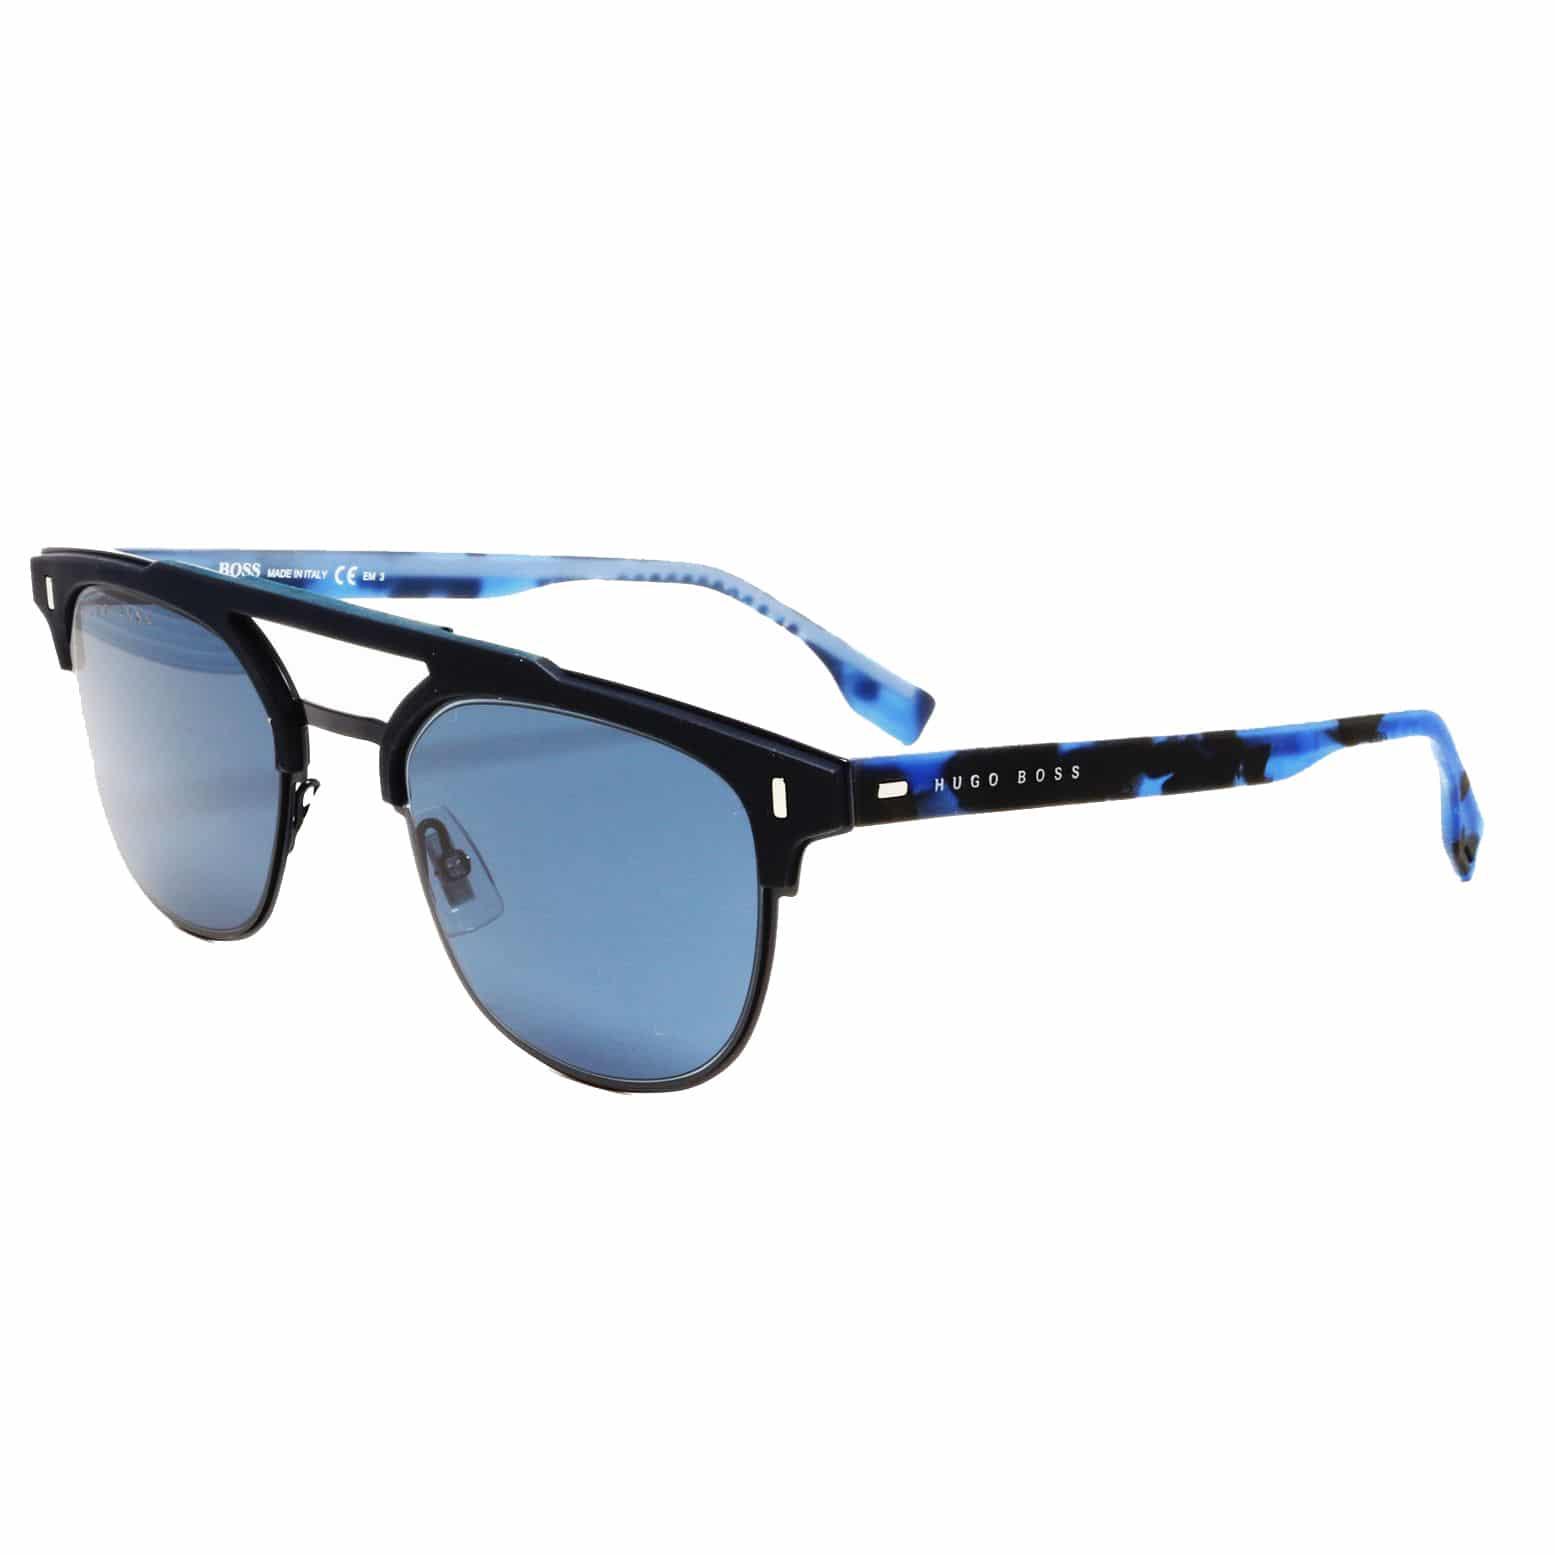 d94bf47554 Hugo Boss Blue Marble Sunglasses Men 0968 SFLL53A9 - Sunlab Malta